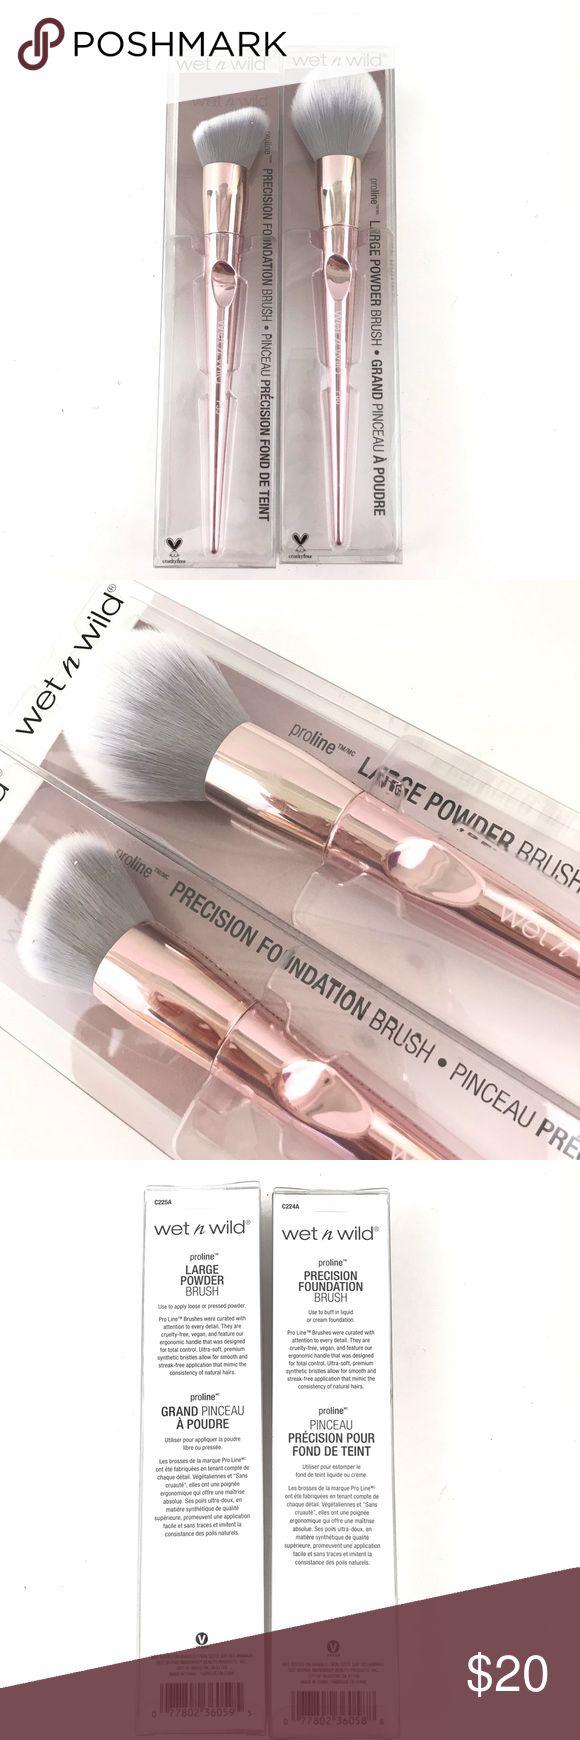 Moist N Wild Proline Make-up Brushes Pink Metallic Moist N Wild Proline Make-up Brushe…